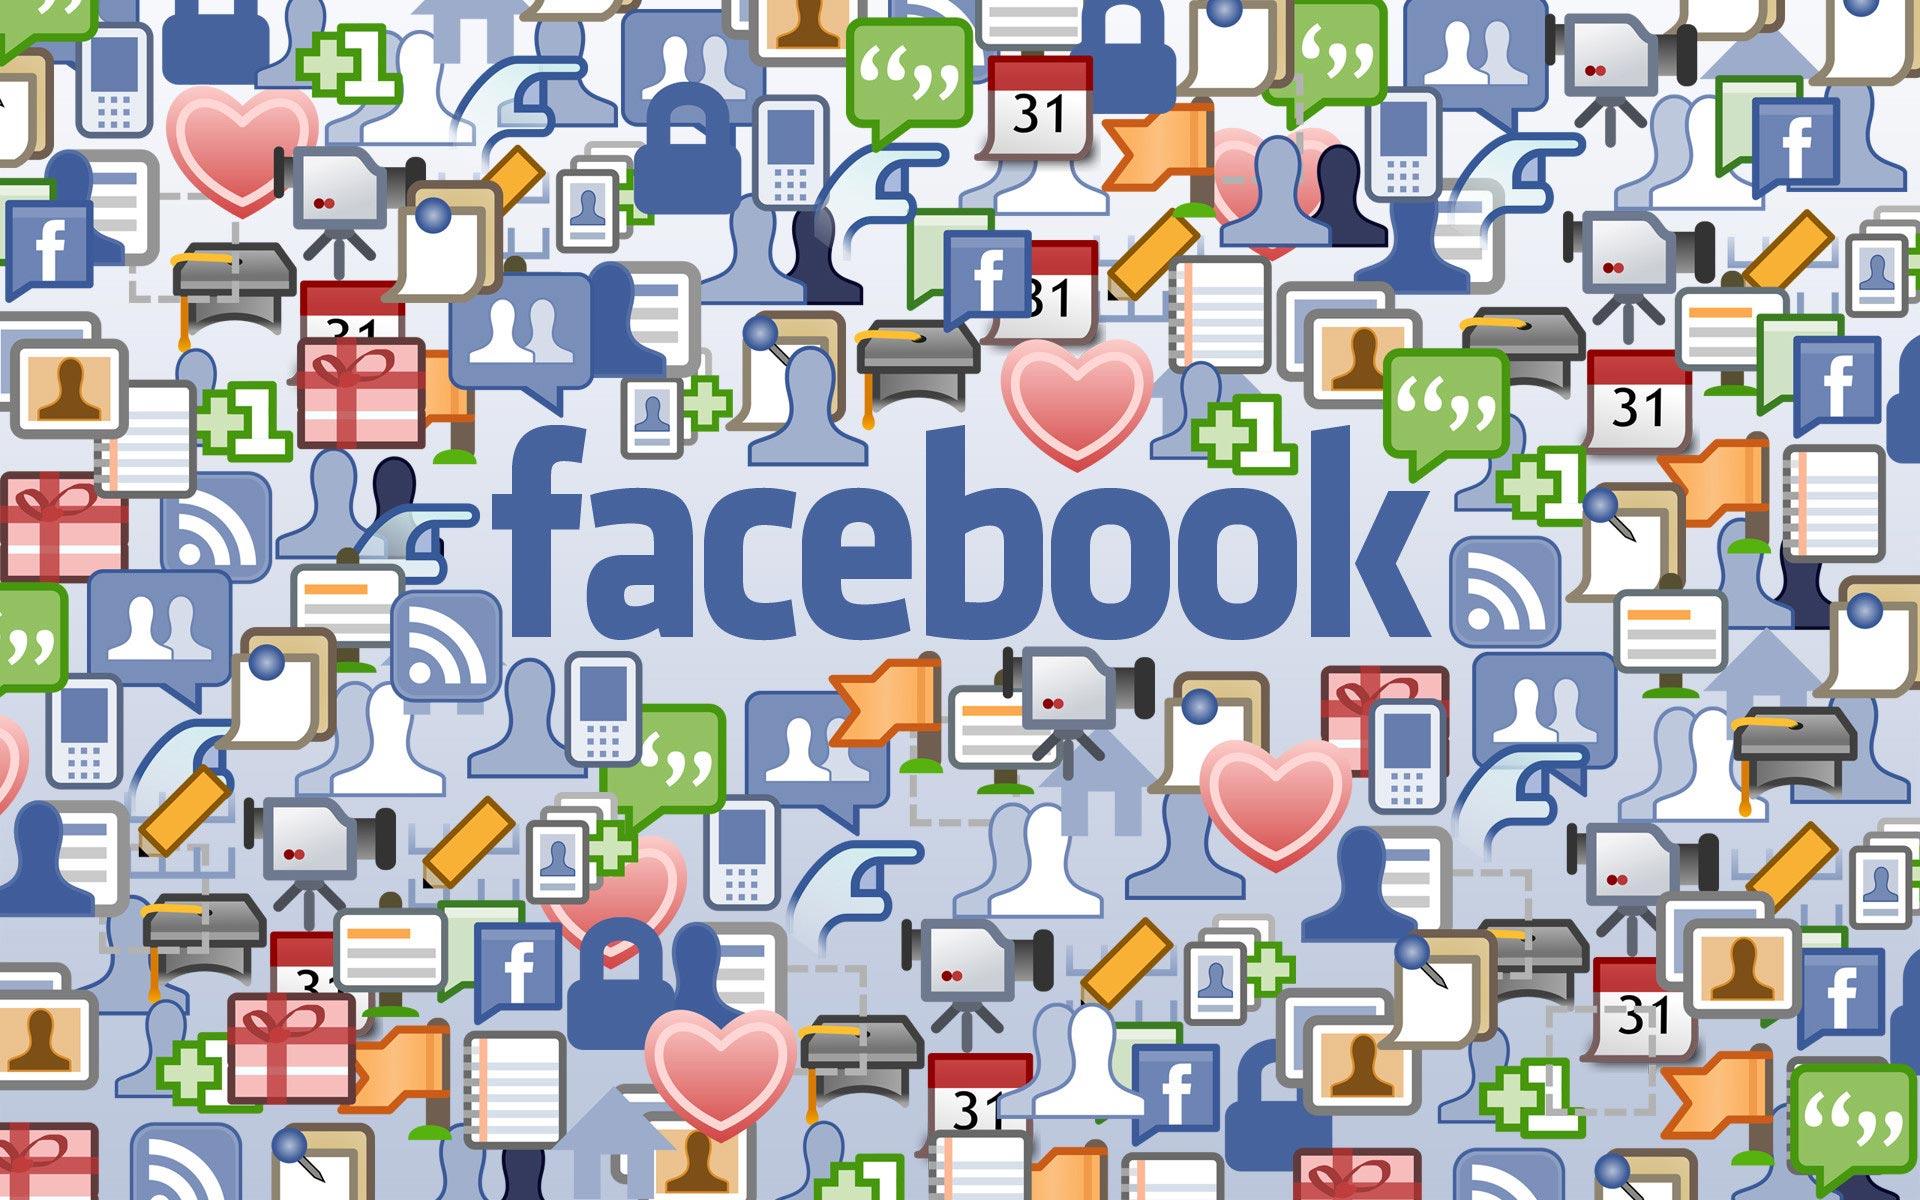 400 Pixels Wide Images for Facebook Cover